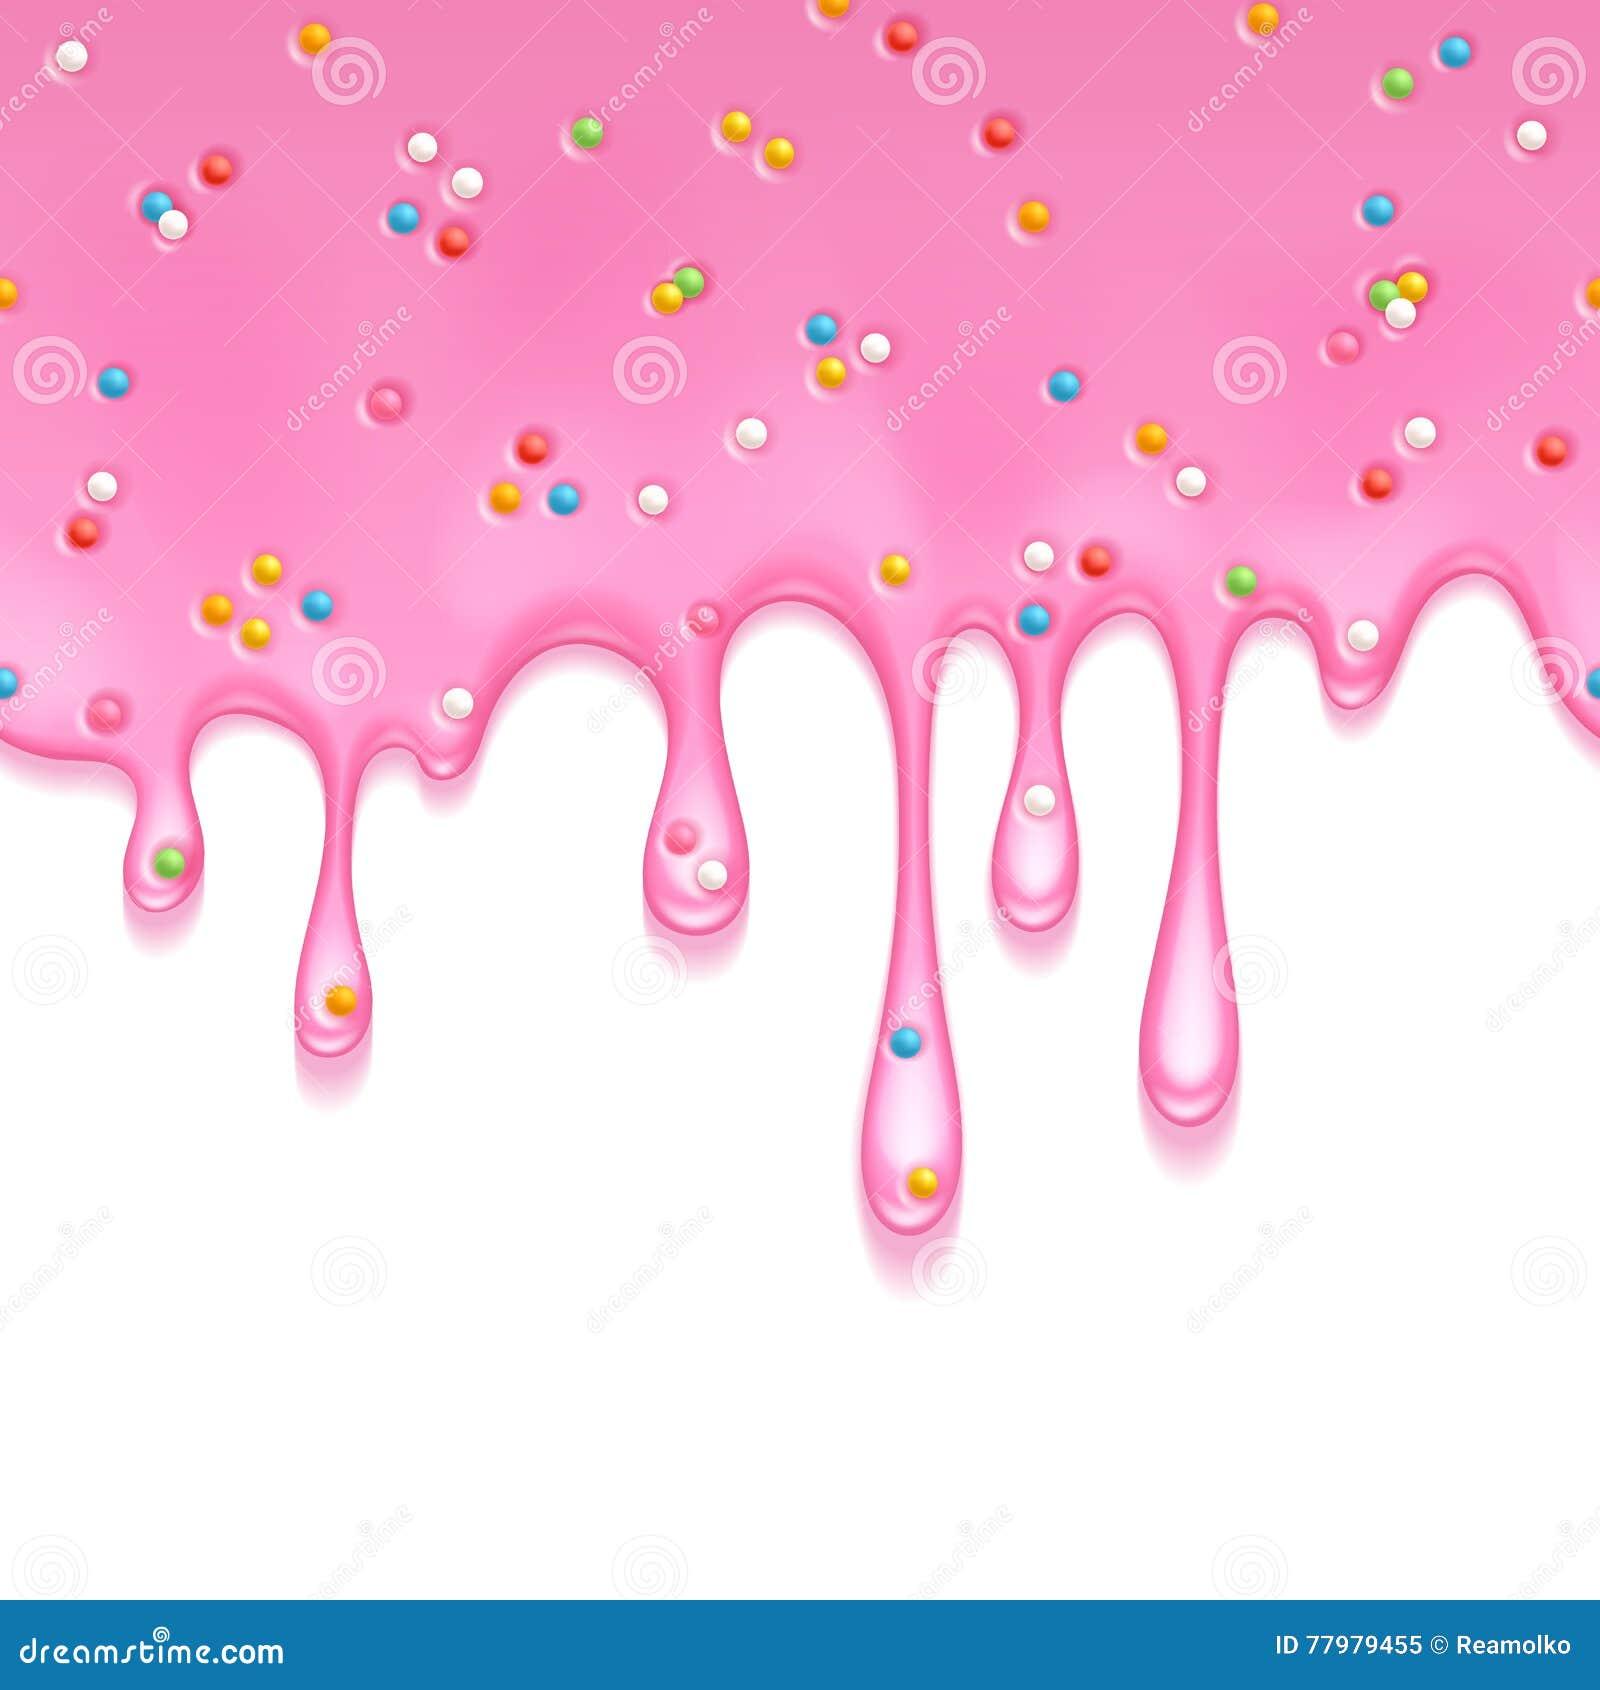 Popular Ice Cream Wallpaper Buy Cheap Ice Cream Wallpaper: Jellylike Cartoons, Illustrations & Vector Stock Images